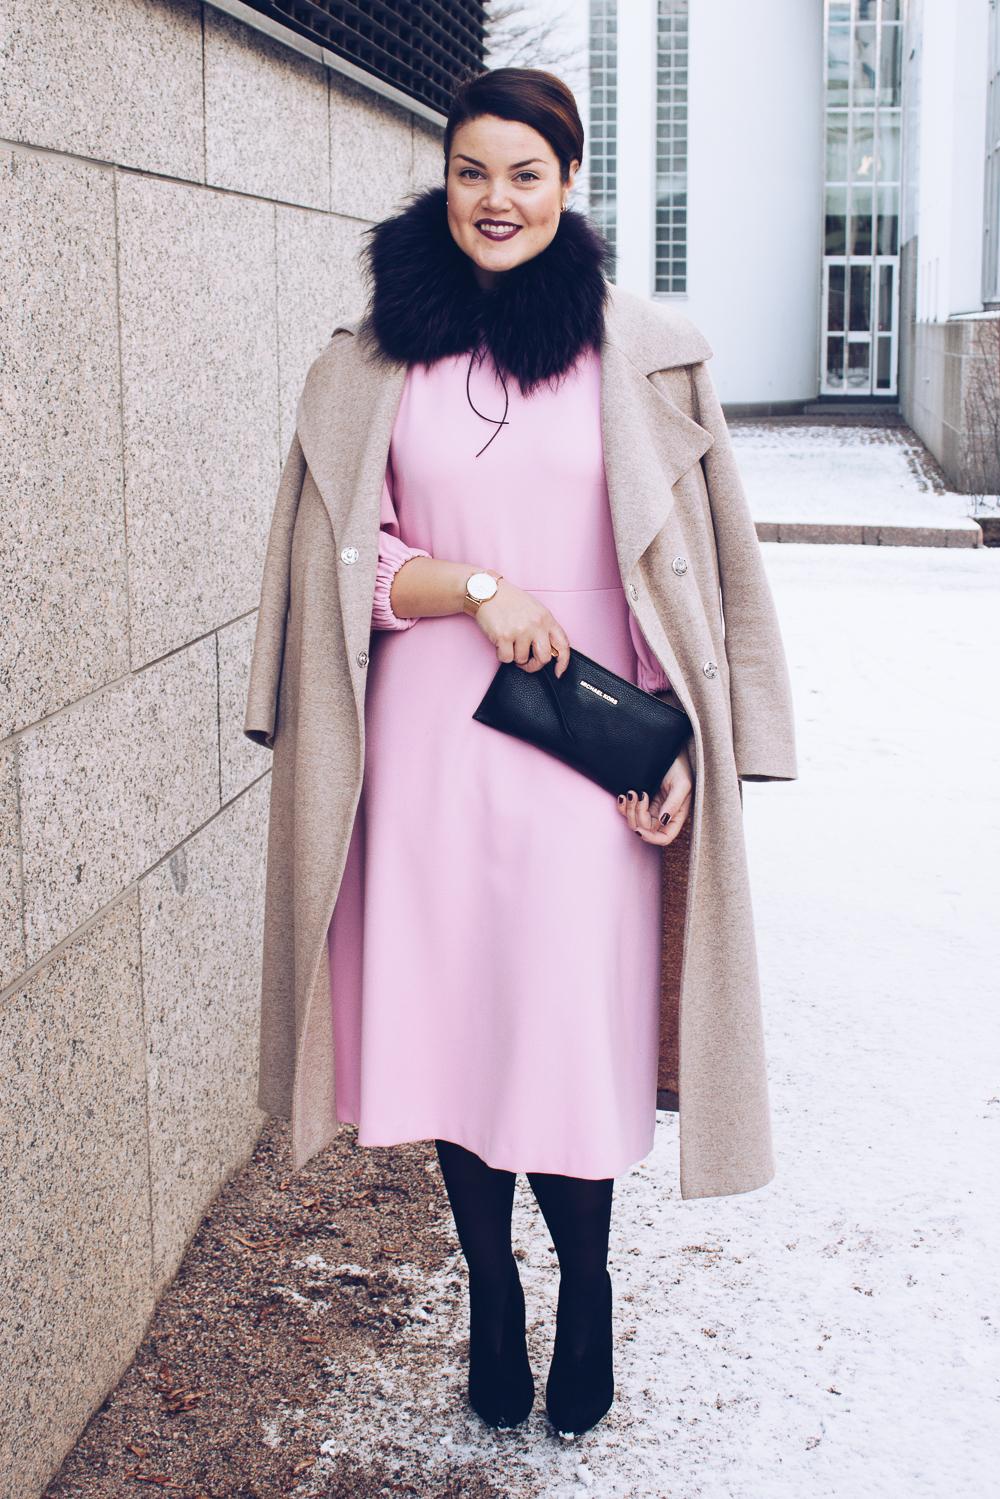 pinkdress-10